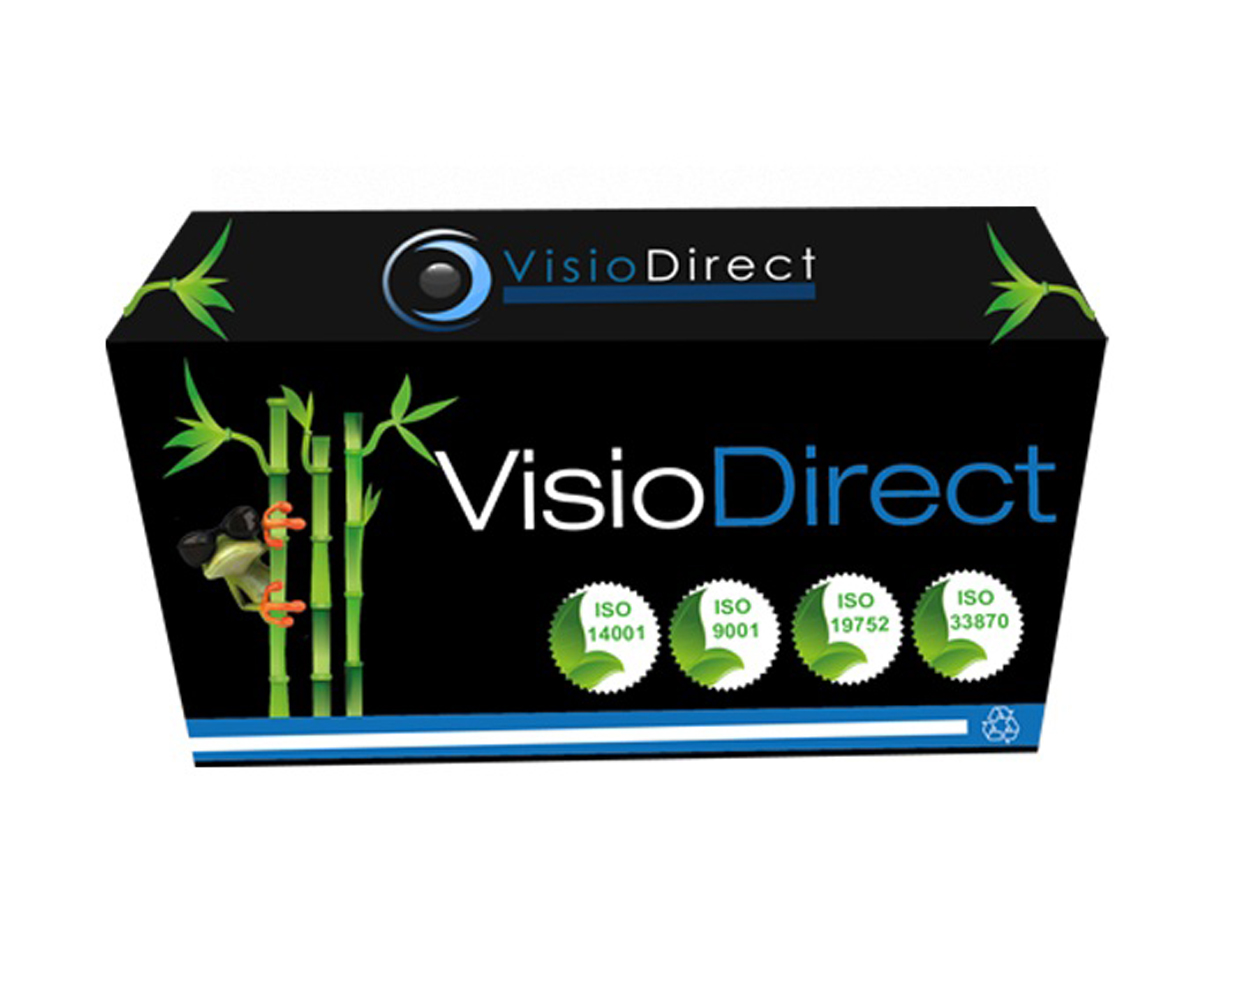 Visiodirect.net